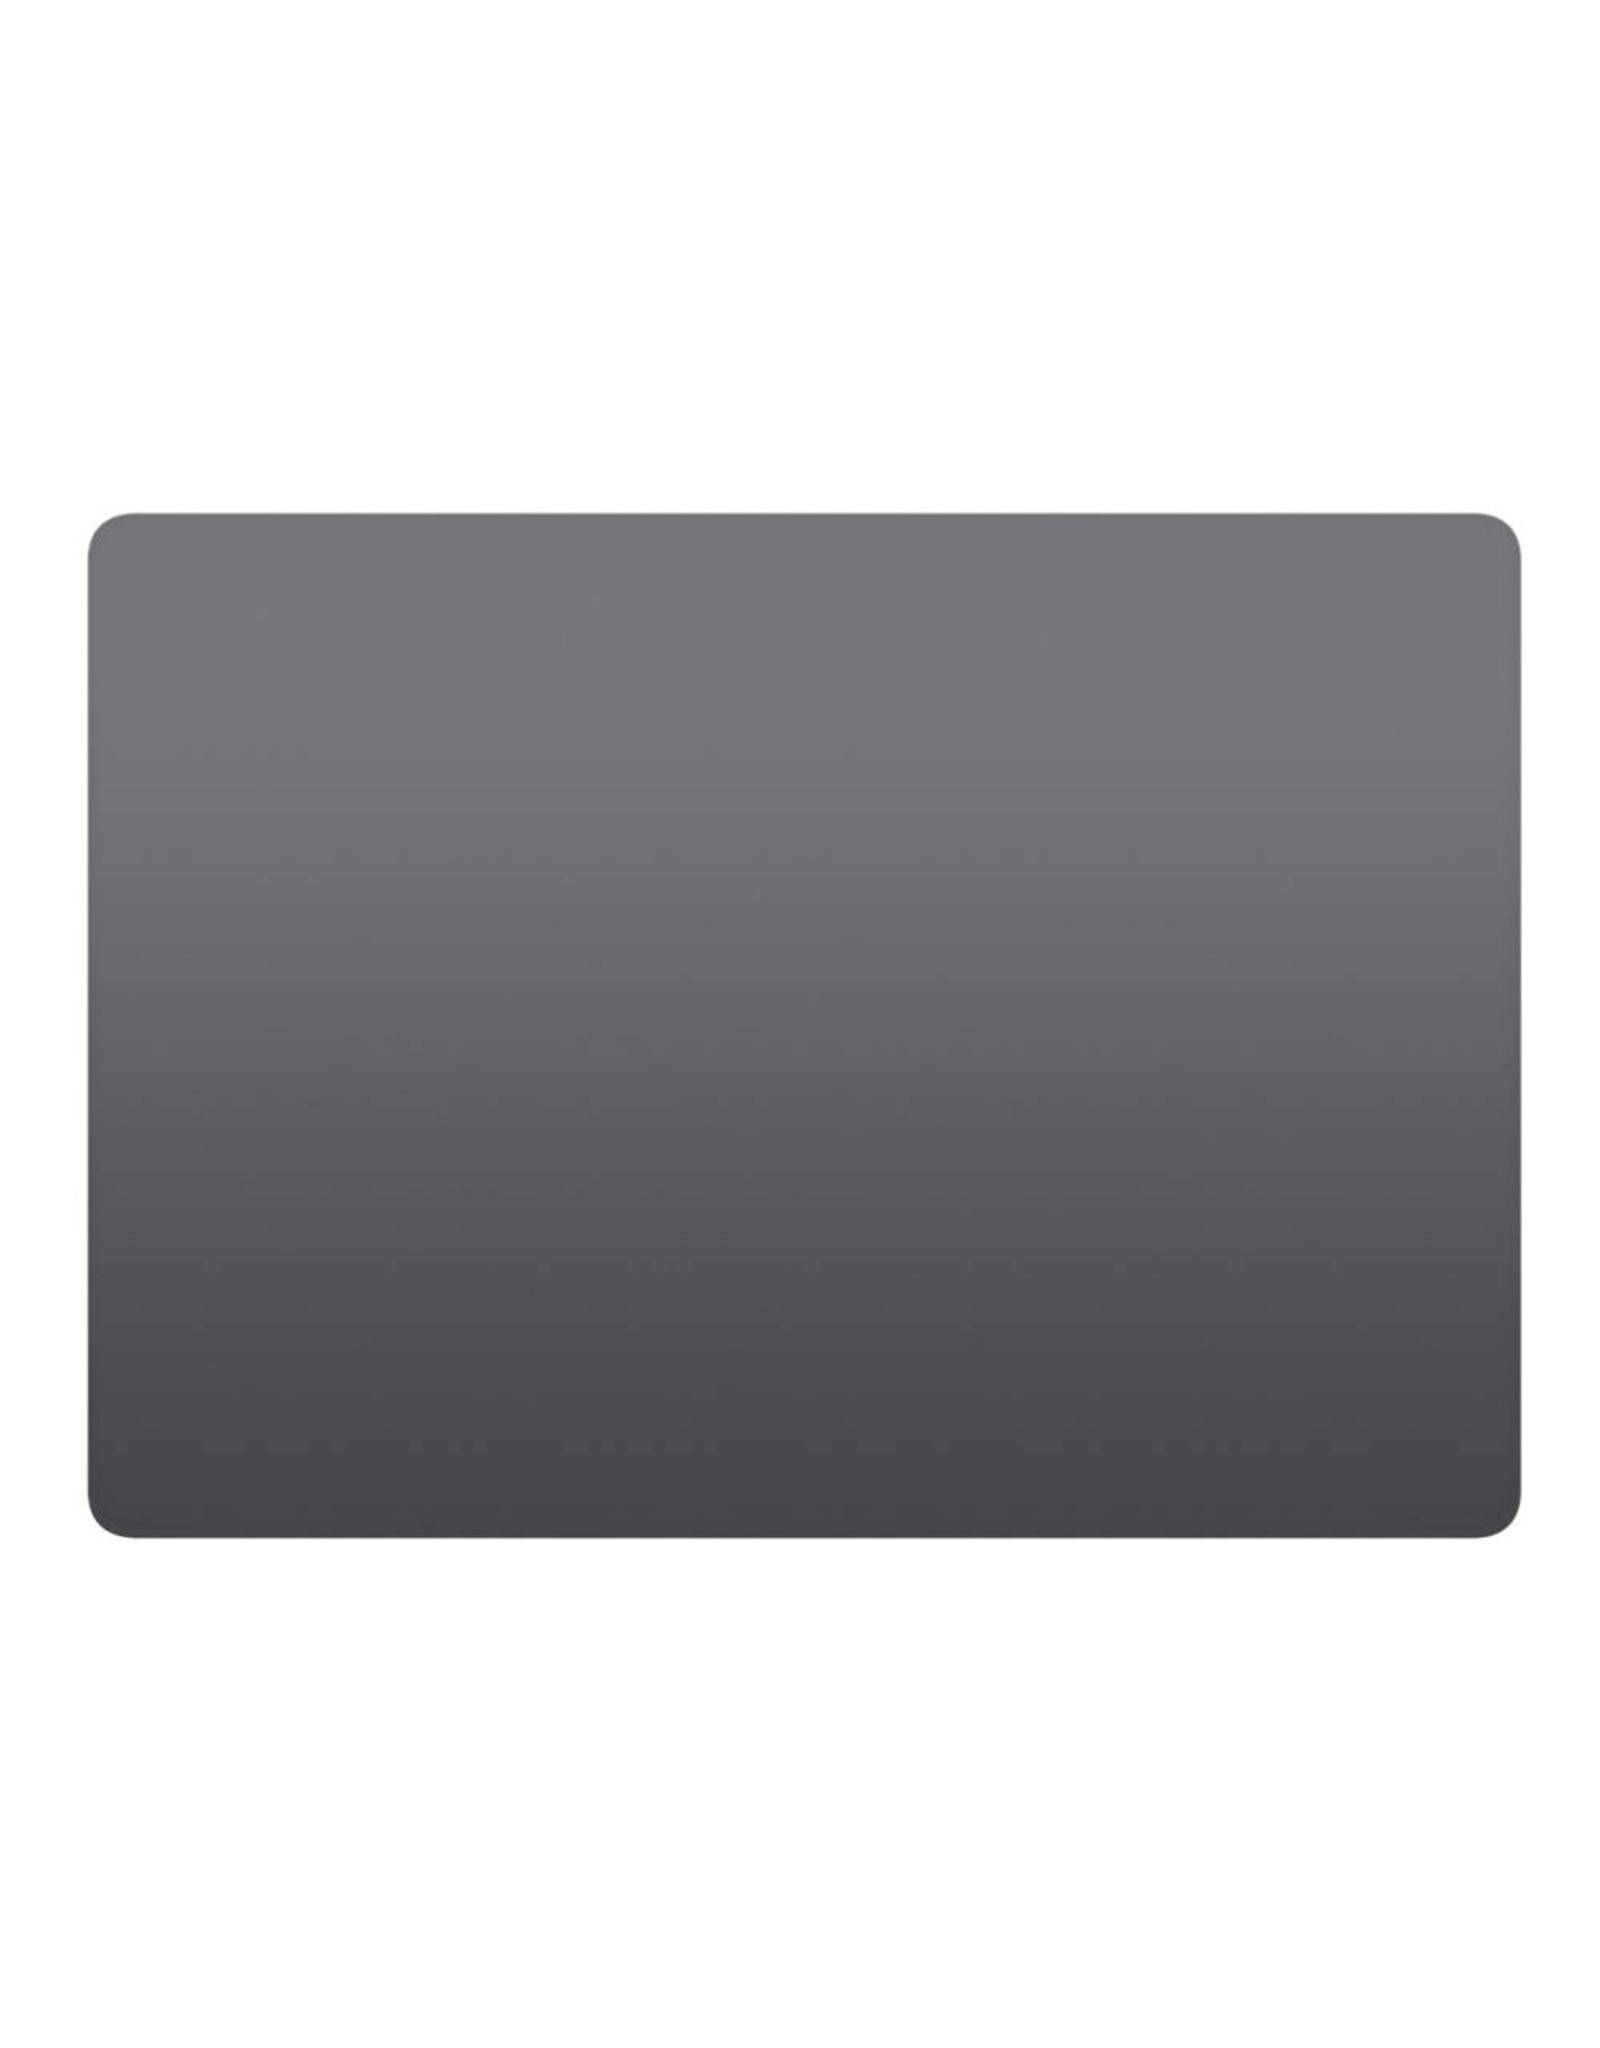 Apple Apple Magic Trackpad 2 Draadloos Grijs touch pad